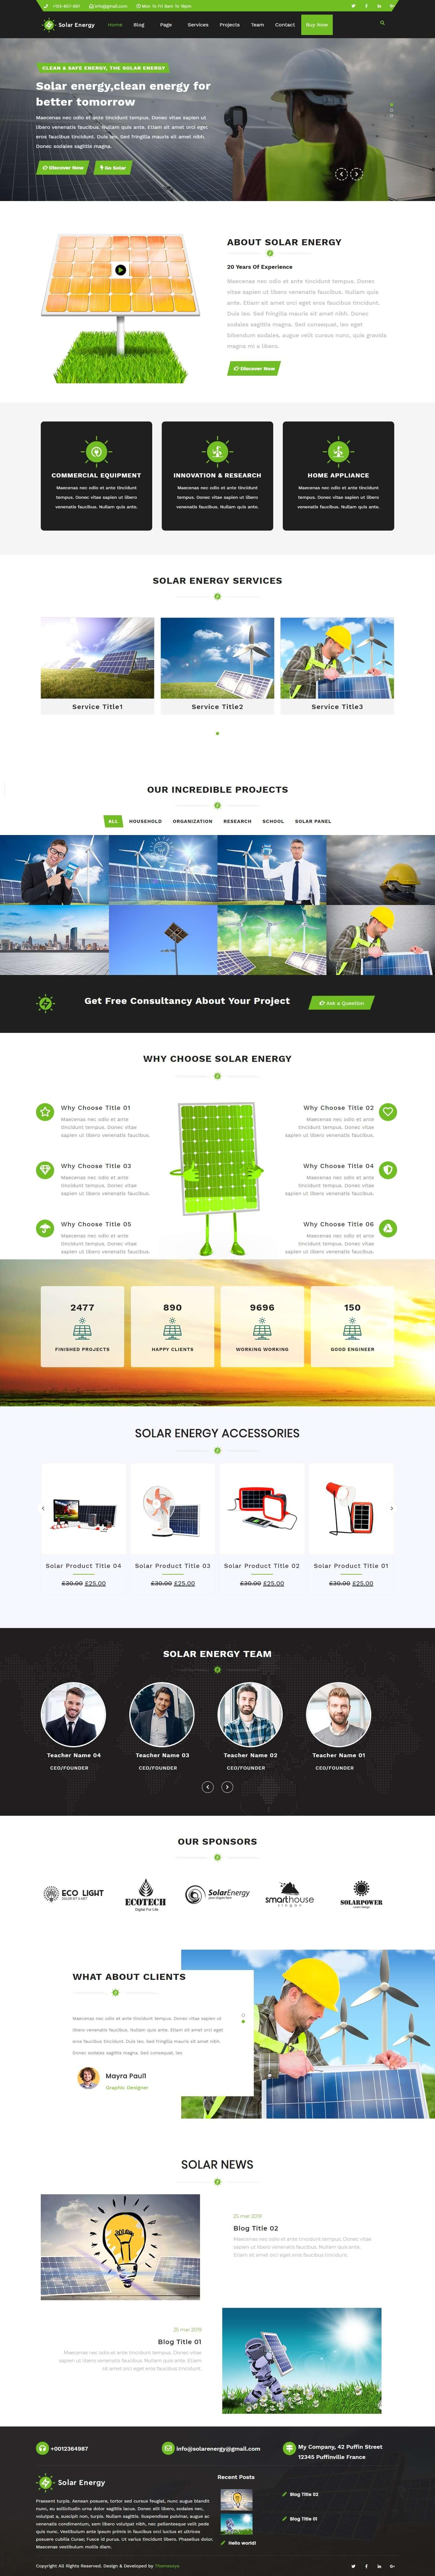 Shams Solar